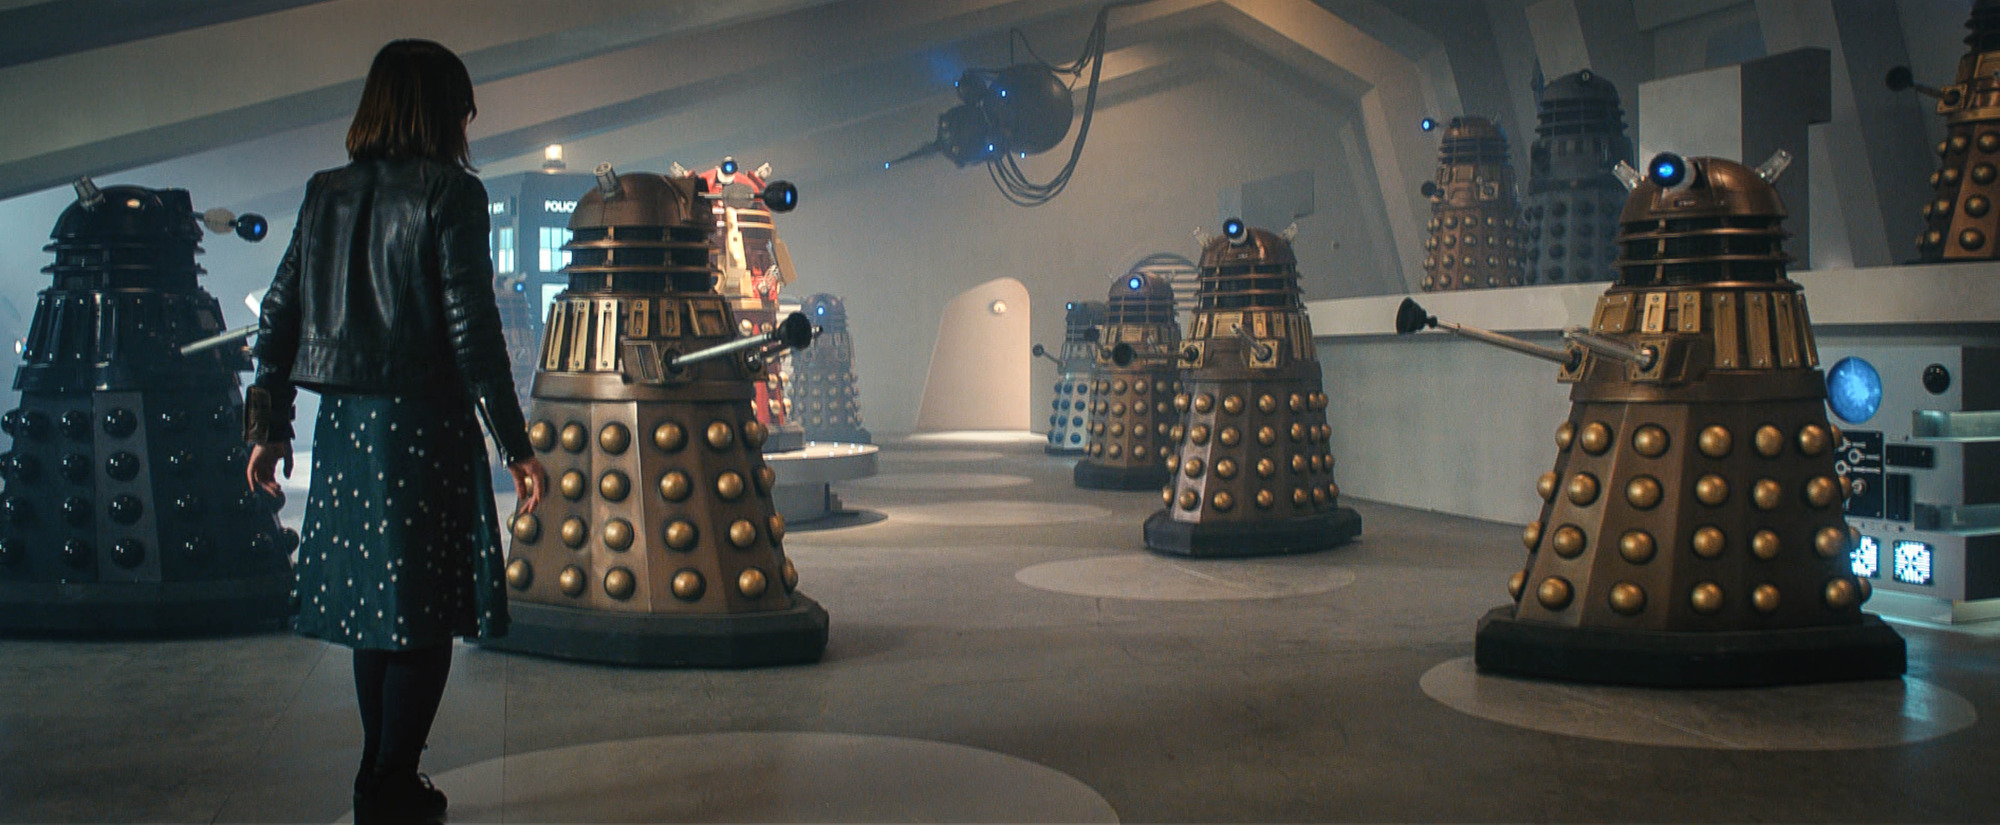 Doctor Who  series 9 Daleks